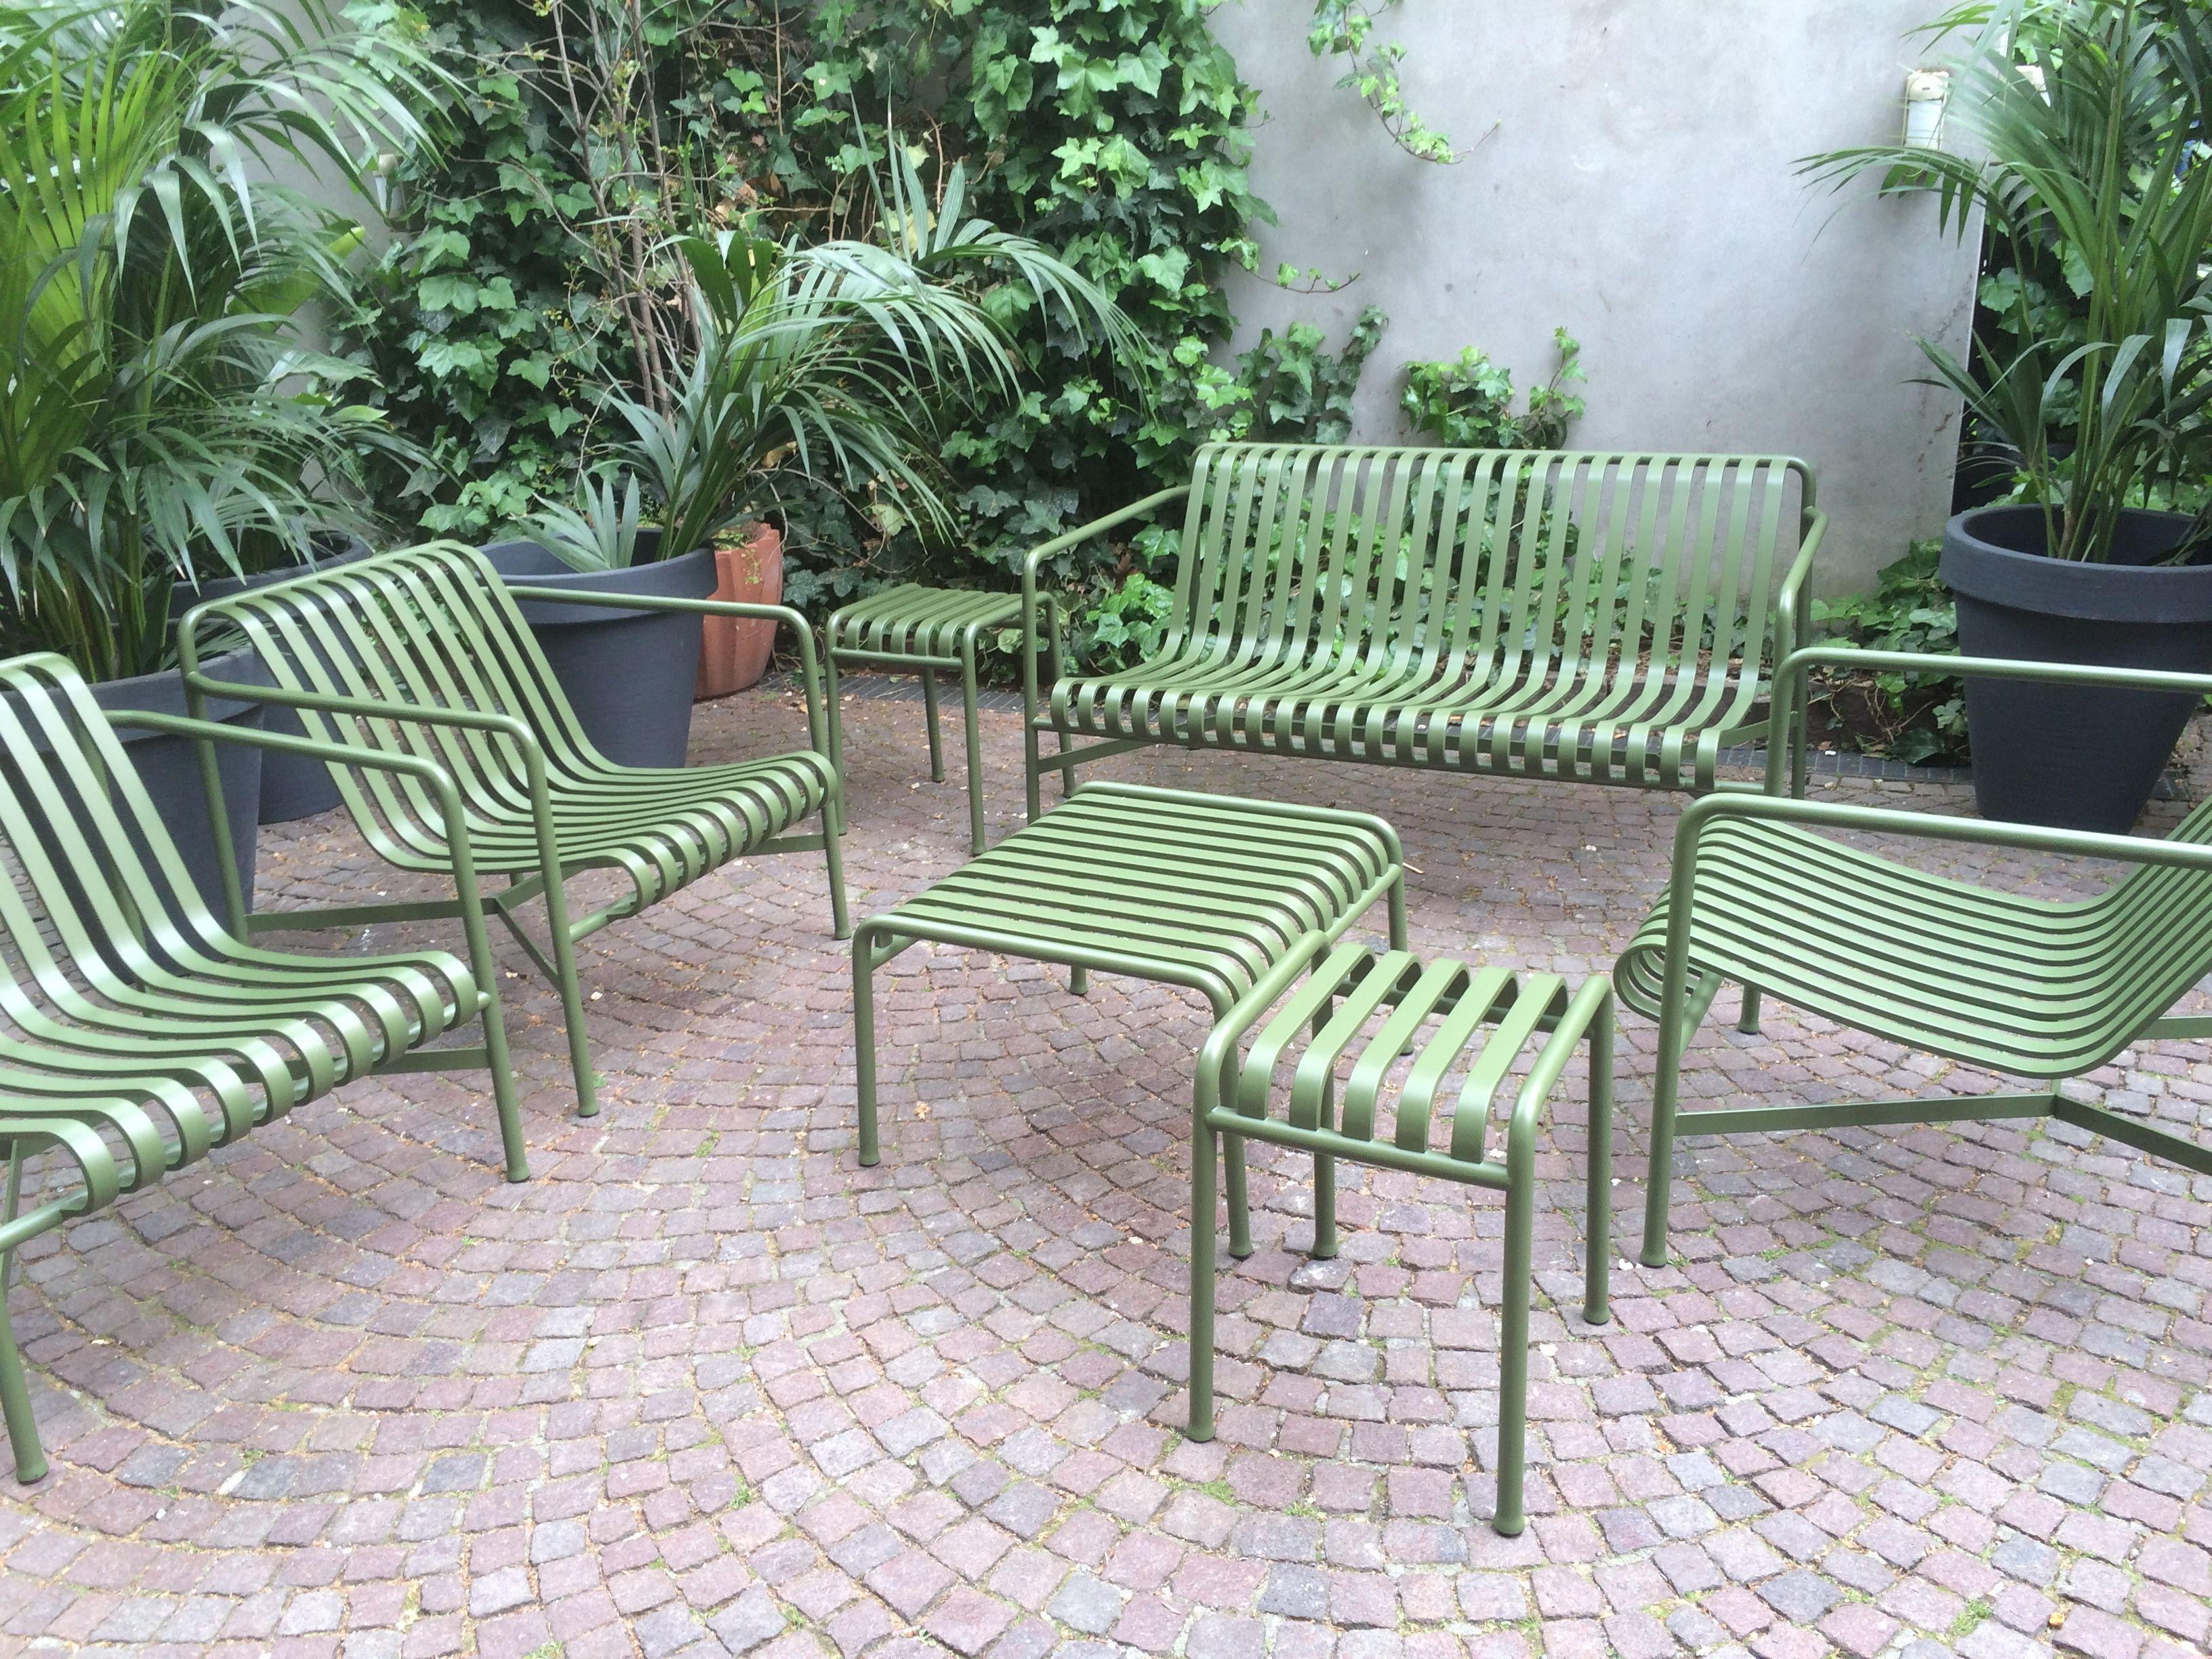 Salone Del Mobile Milano   Beurs Milaan   Outdoor   HAY   Palissade  Collection